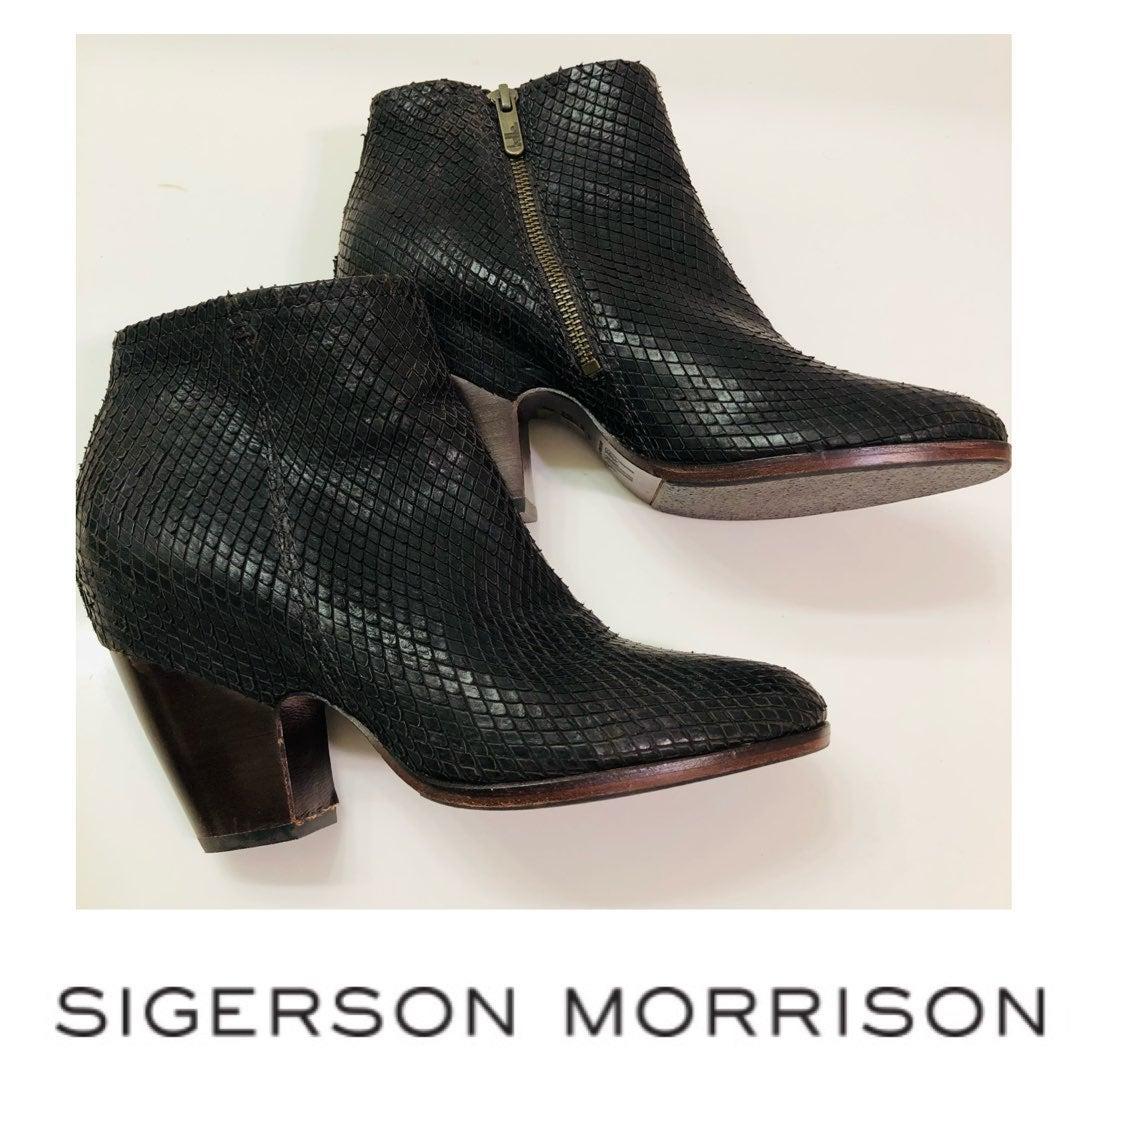 NWOT Belle by Sigerson Morrison Ankle Bo